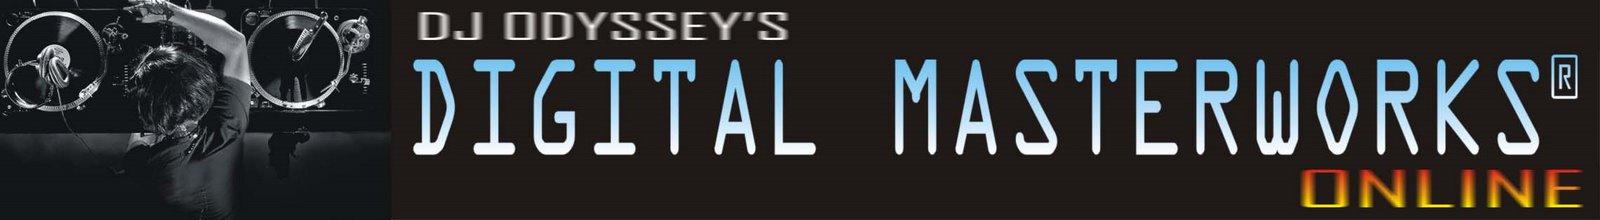 Digital Masterworks Online